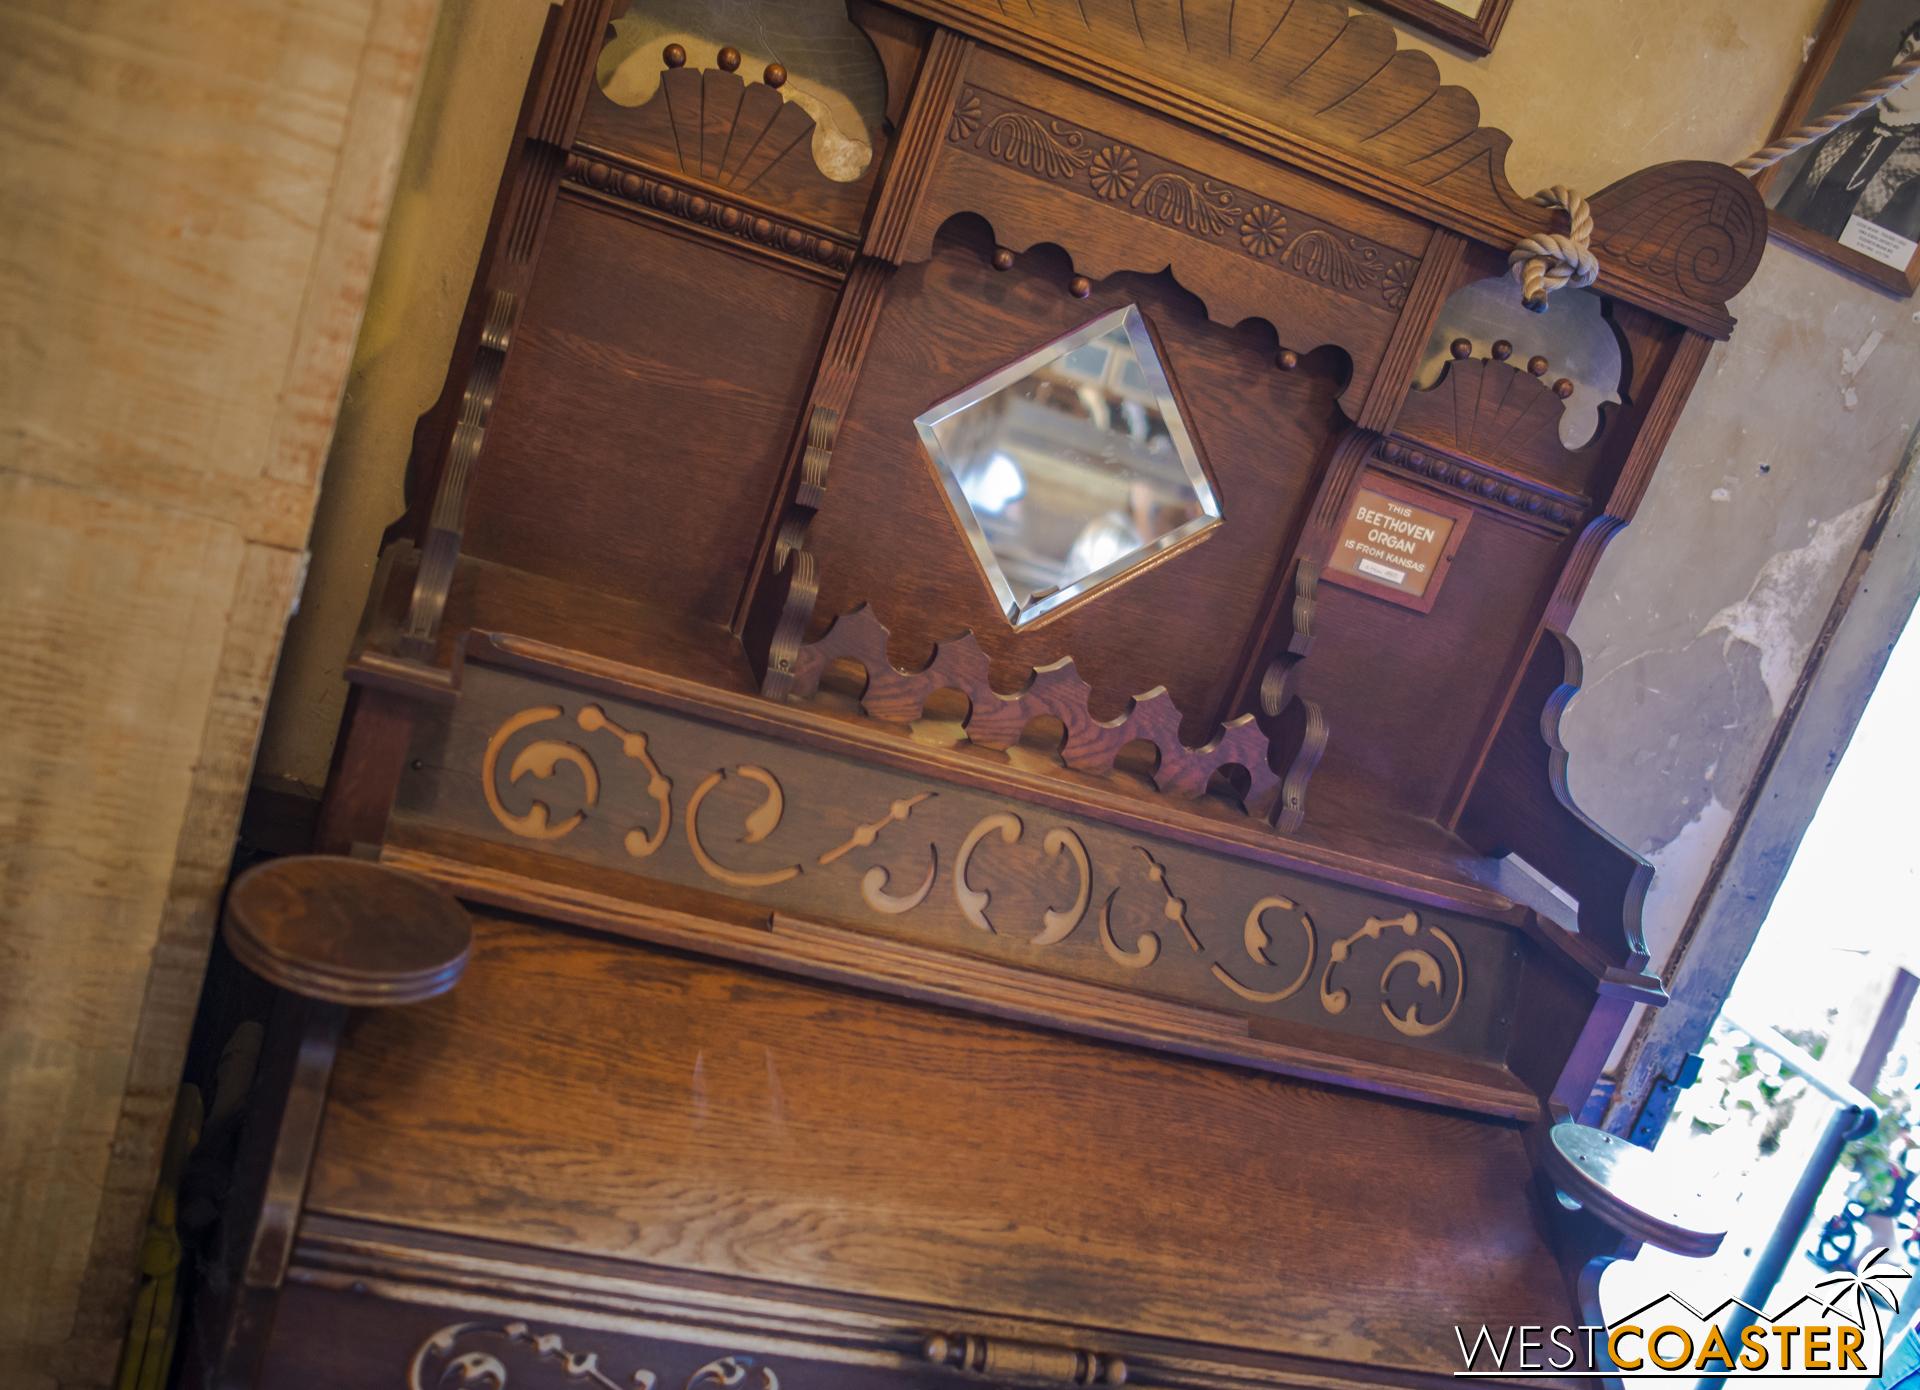 A little organ, also historic.